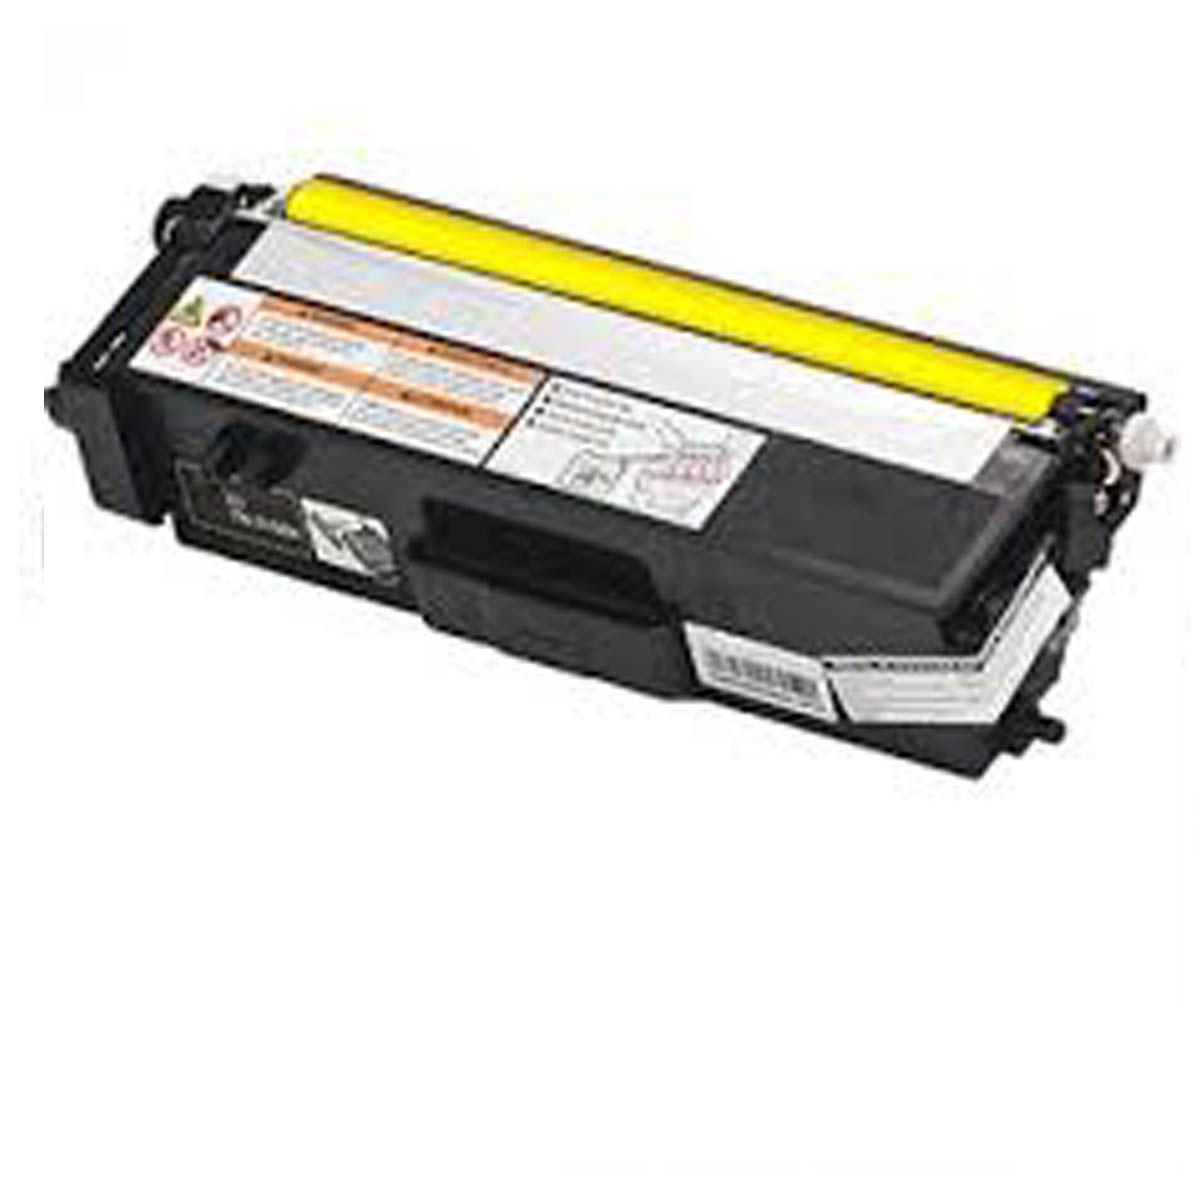 Toner Brother TN315 TN325 TN345 TN375 MFC9970 MFC9460 HL4570 Amarelo